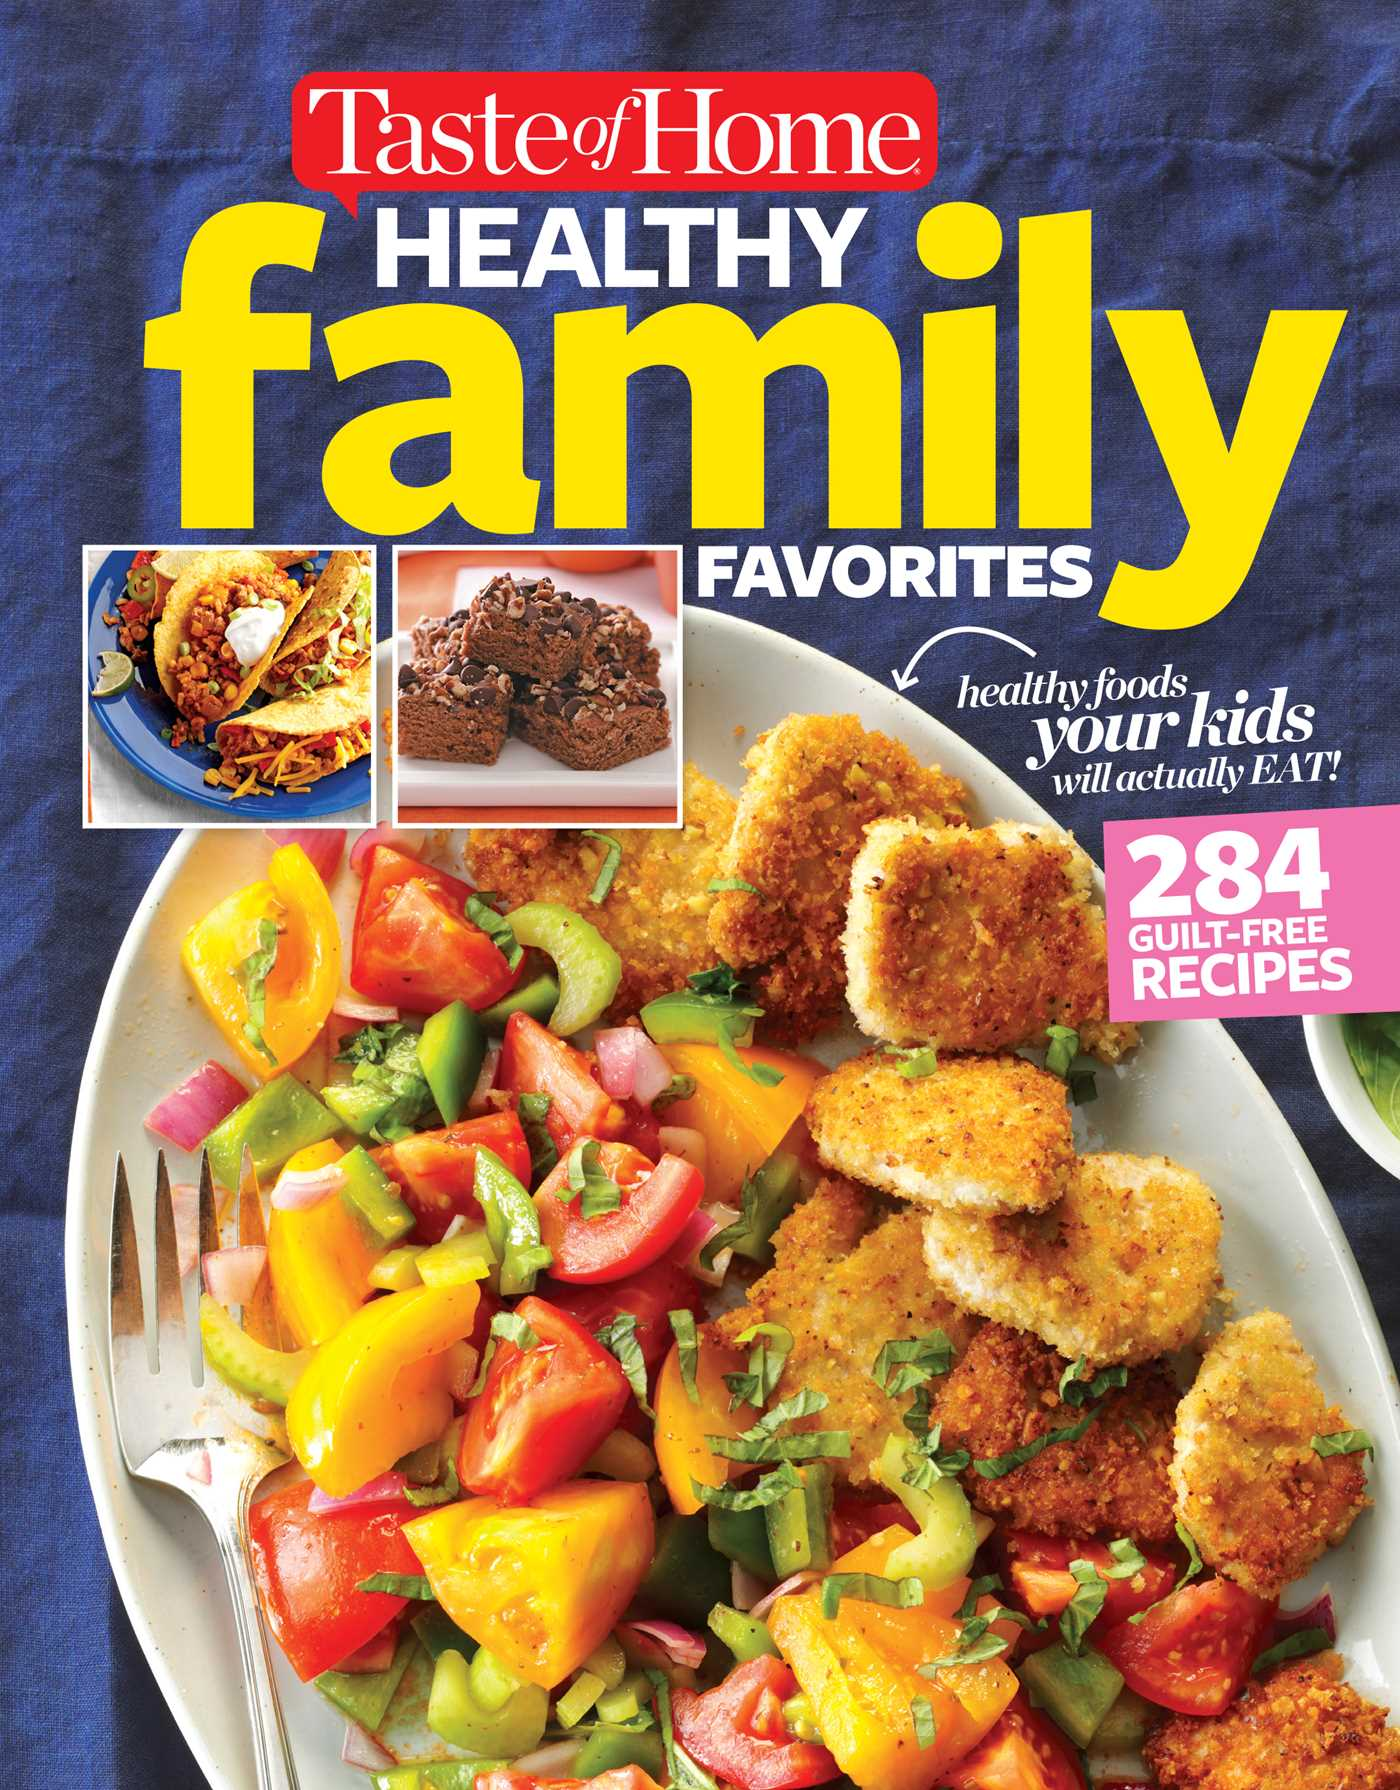 Taste of home healthy family favorites cookbook 9781617657191 hr